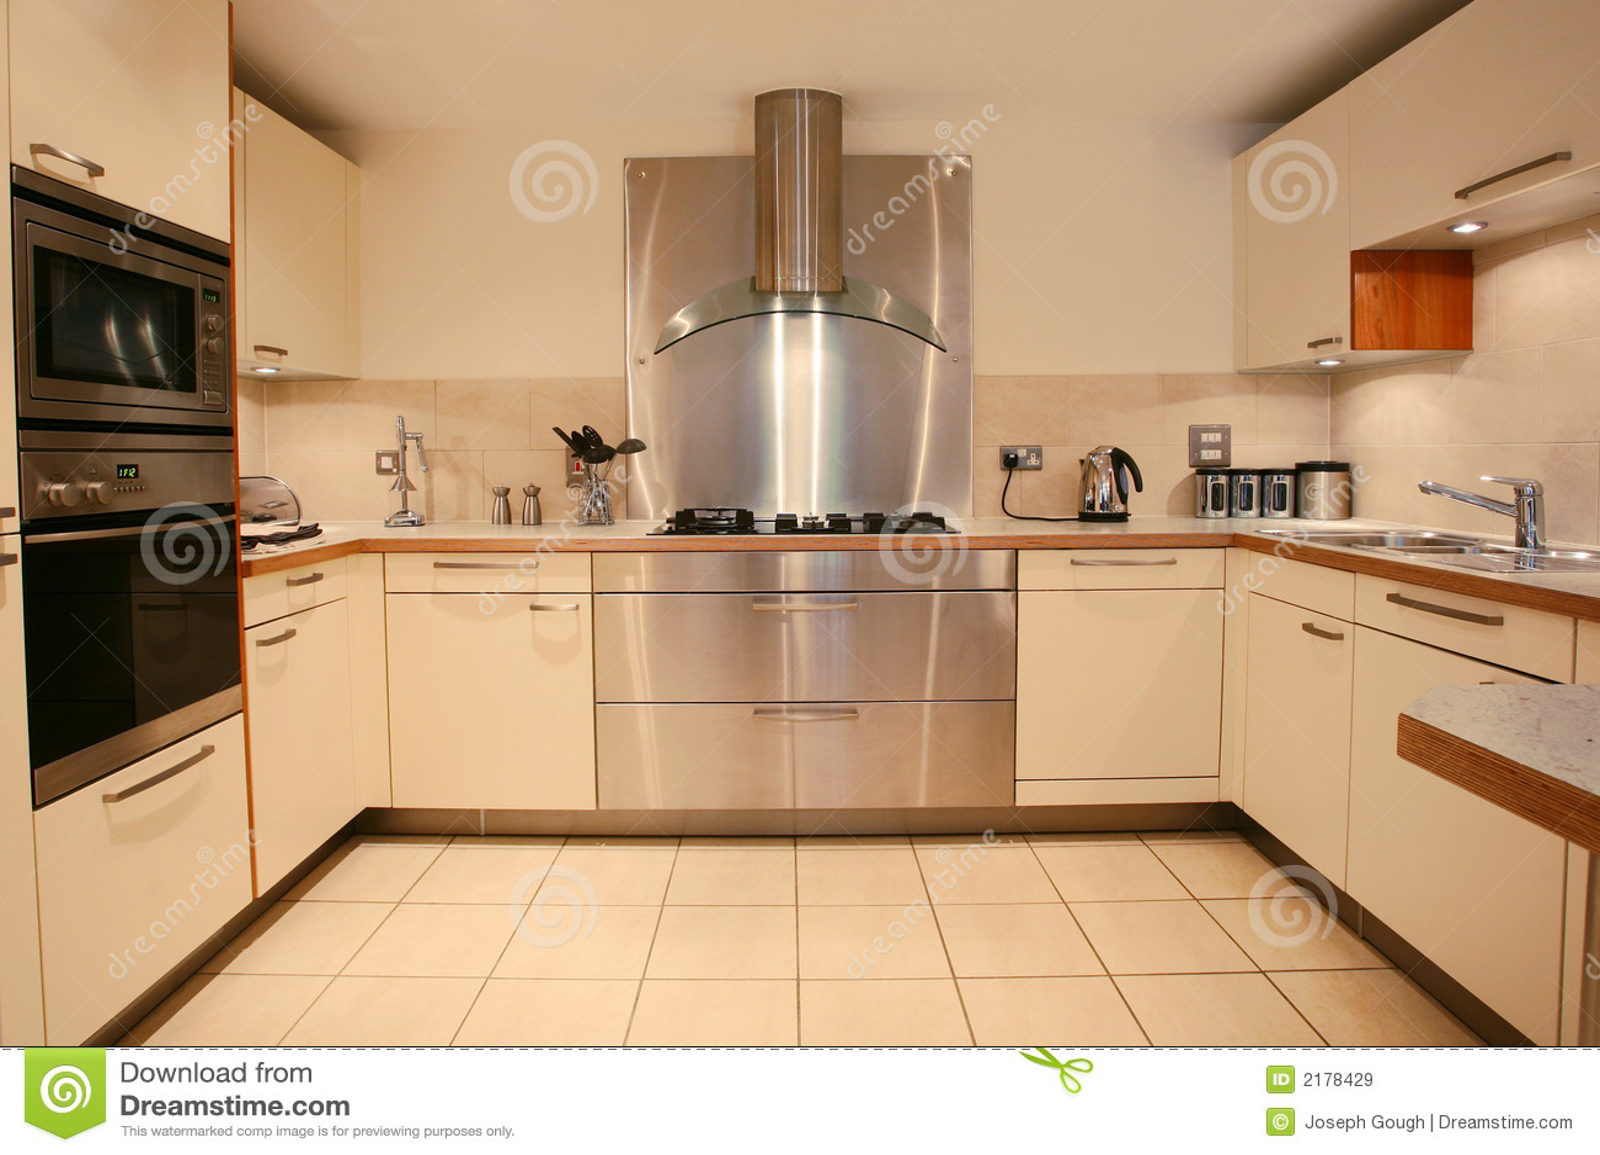 Modern Luxury Kitchen Interior Royalty Free Stock Images  Image